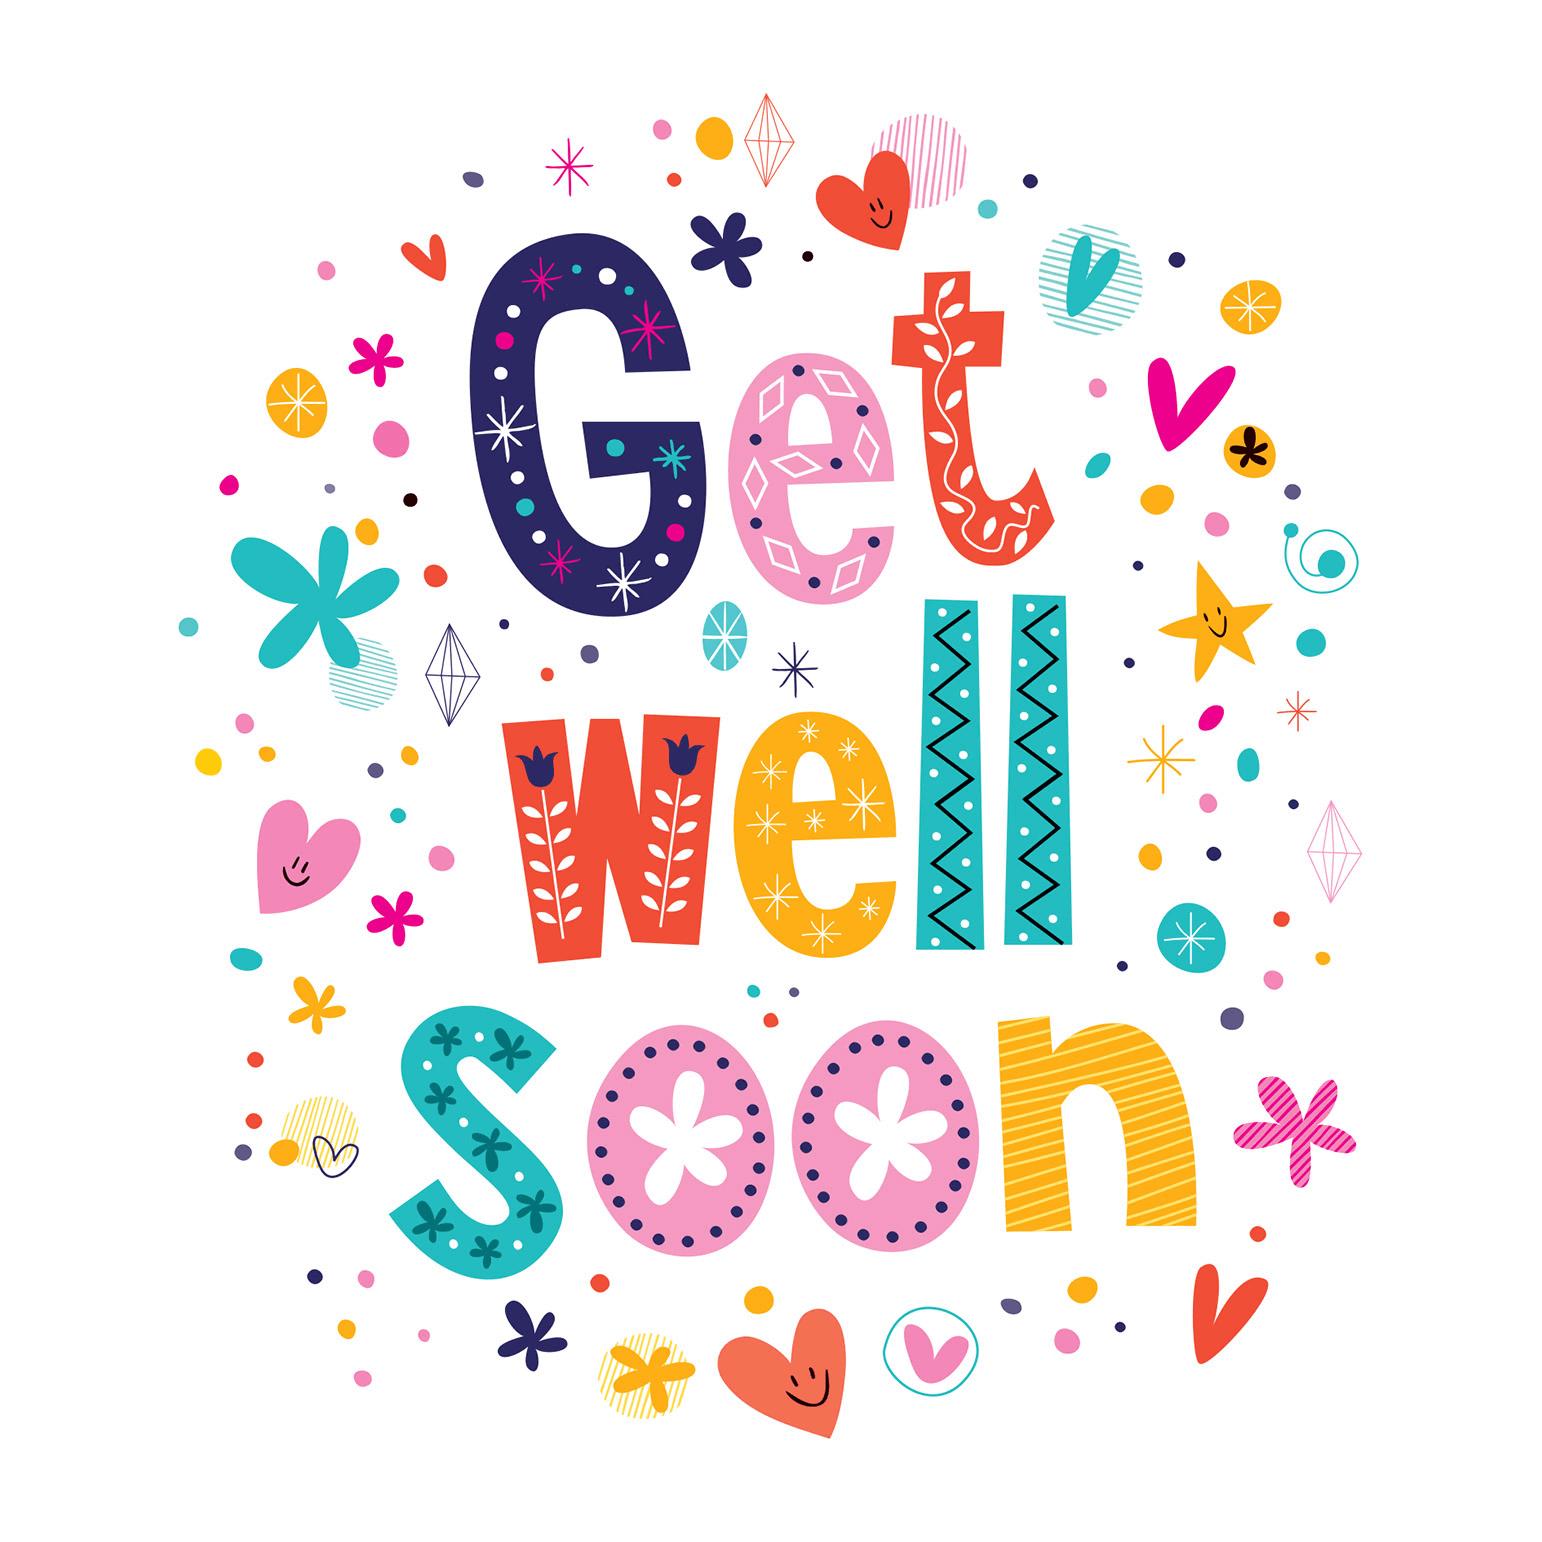 Cheerful Hearts - Get Well Soon Card (Free) | Greetings Island Regarding Get Well Soon Card Template